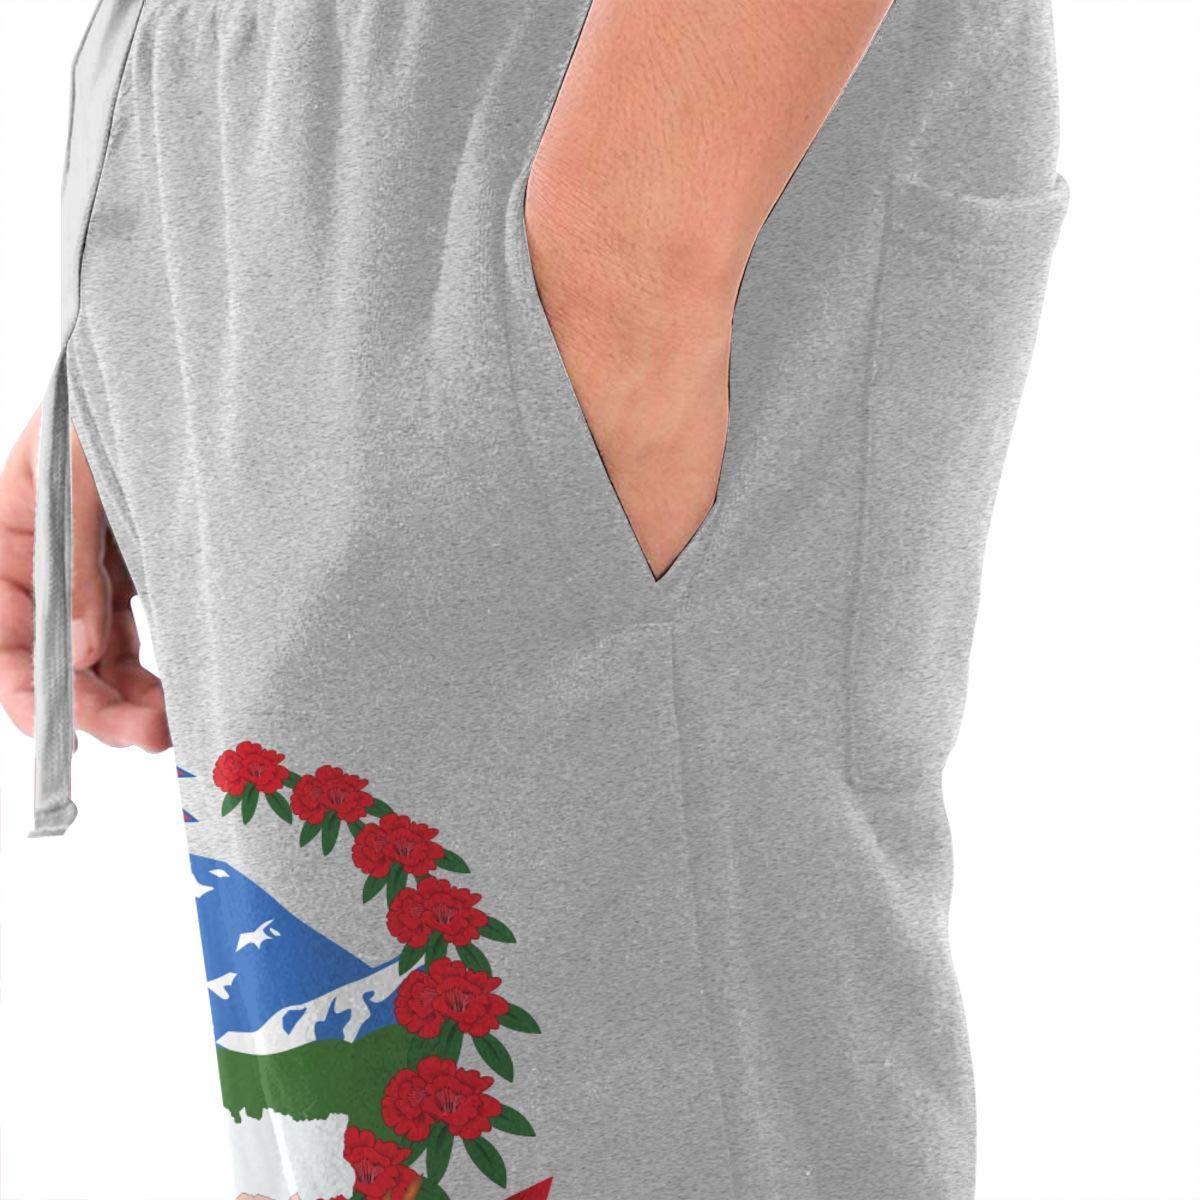 HHCW4LD Emblem of Nepal Mens Joggers Casual Lounge Pajama Gym Workout Yoga Pants Casual Long Pants